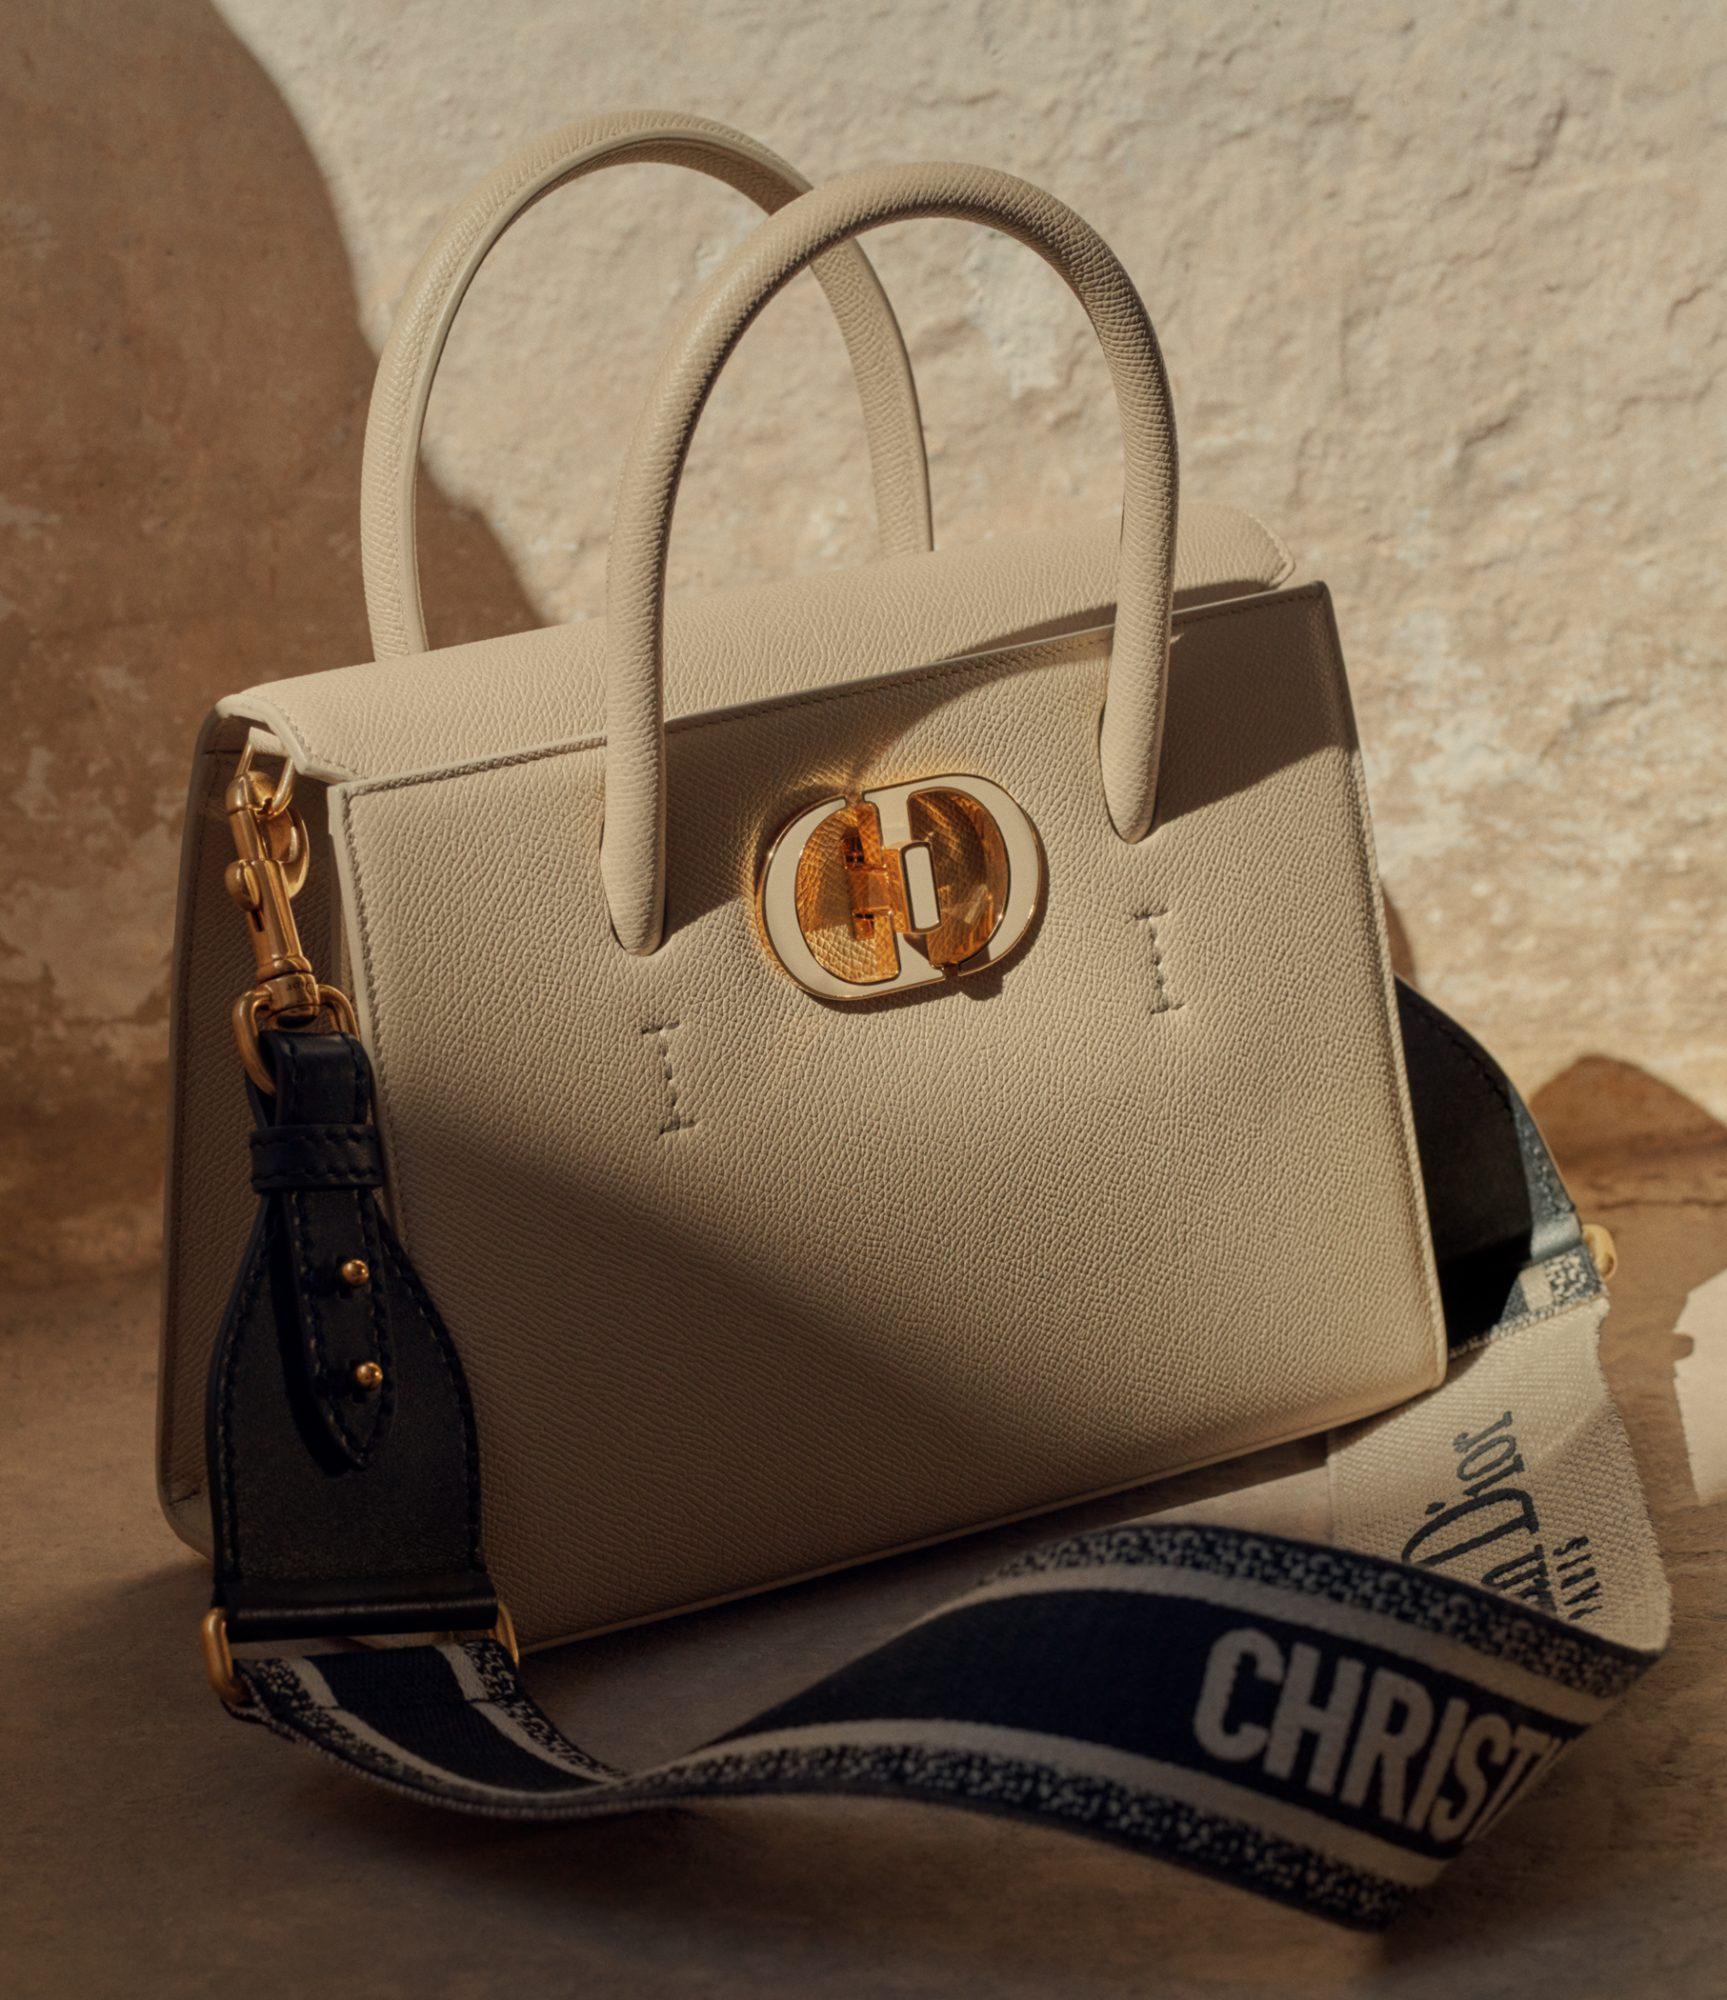 St Honoré: Η νέα τσάντα του οίκου Dior είναι μια ωδή στην κομψότητα